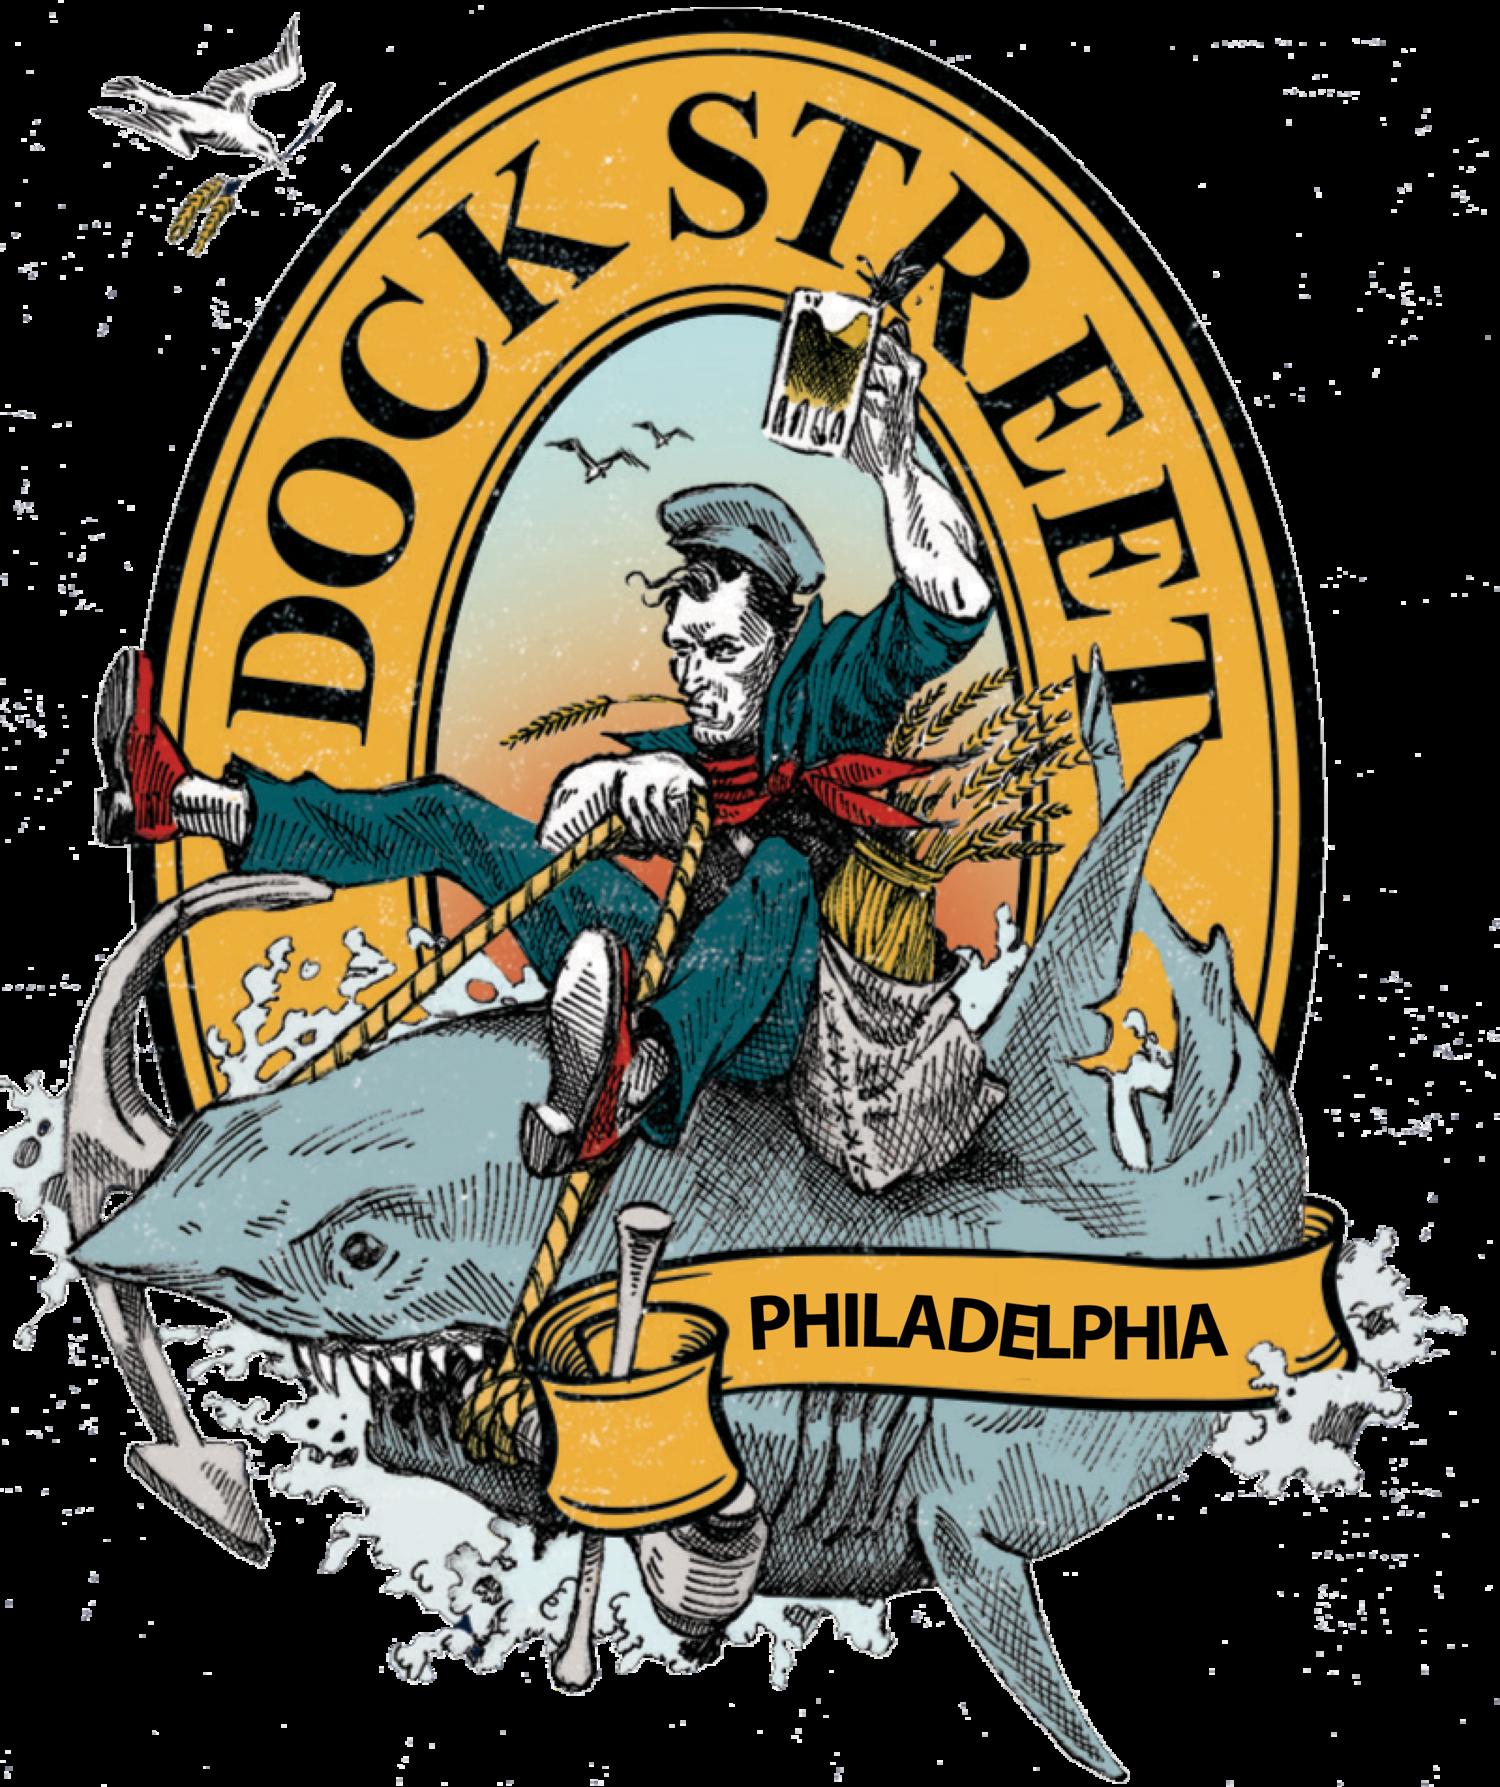 dock street.png